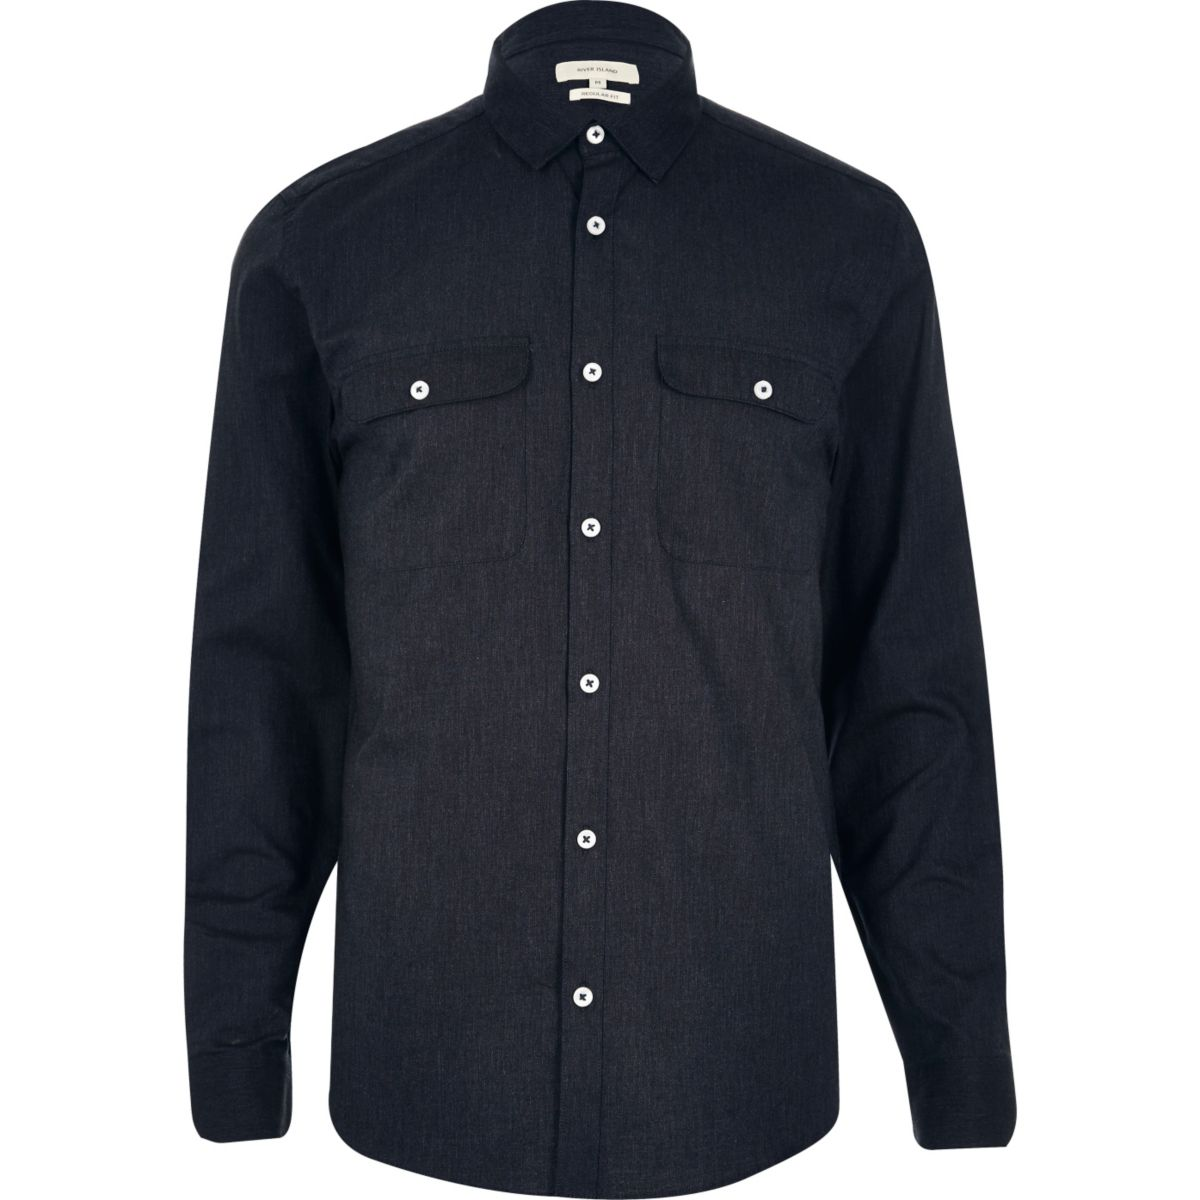 Navy pocket long sleeve shirt